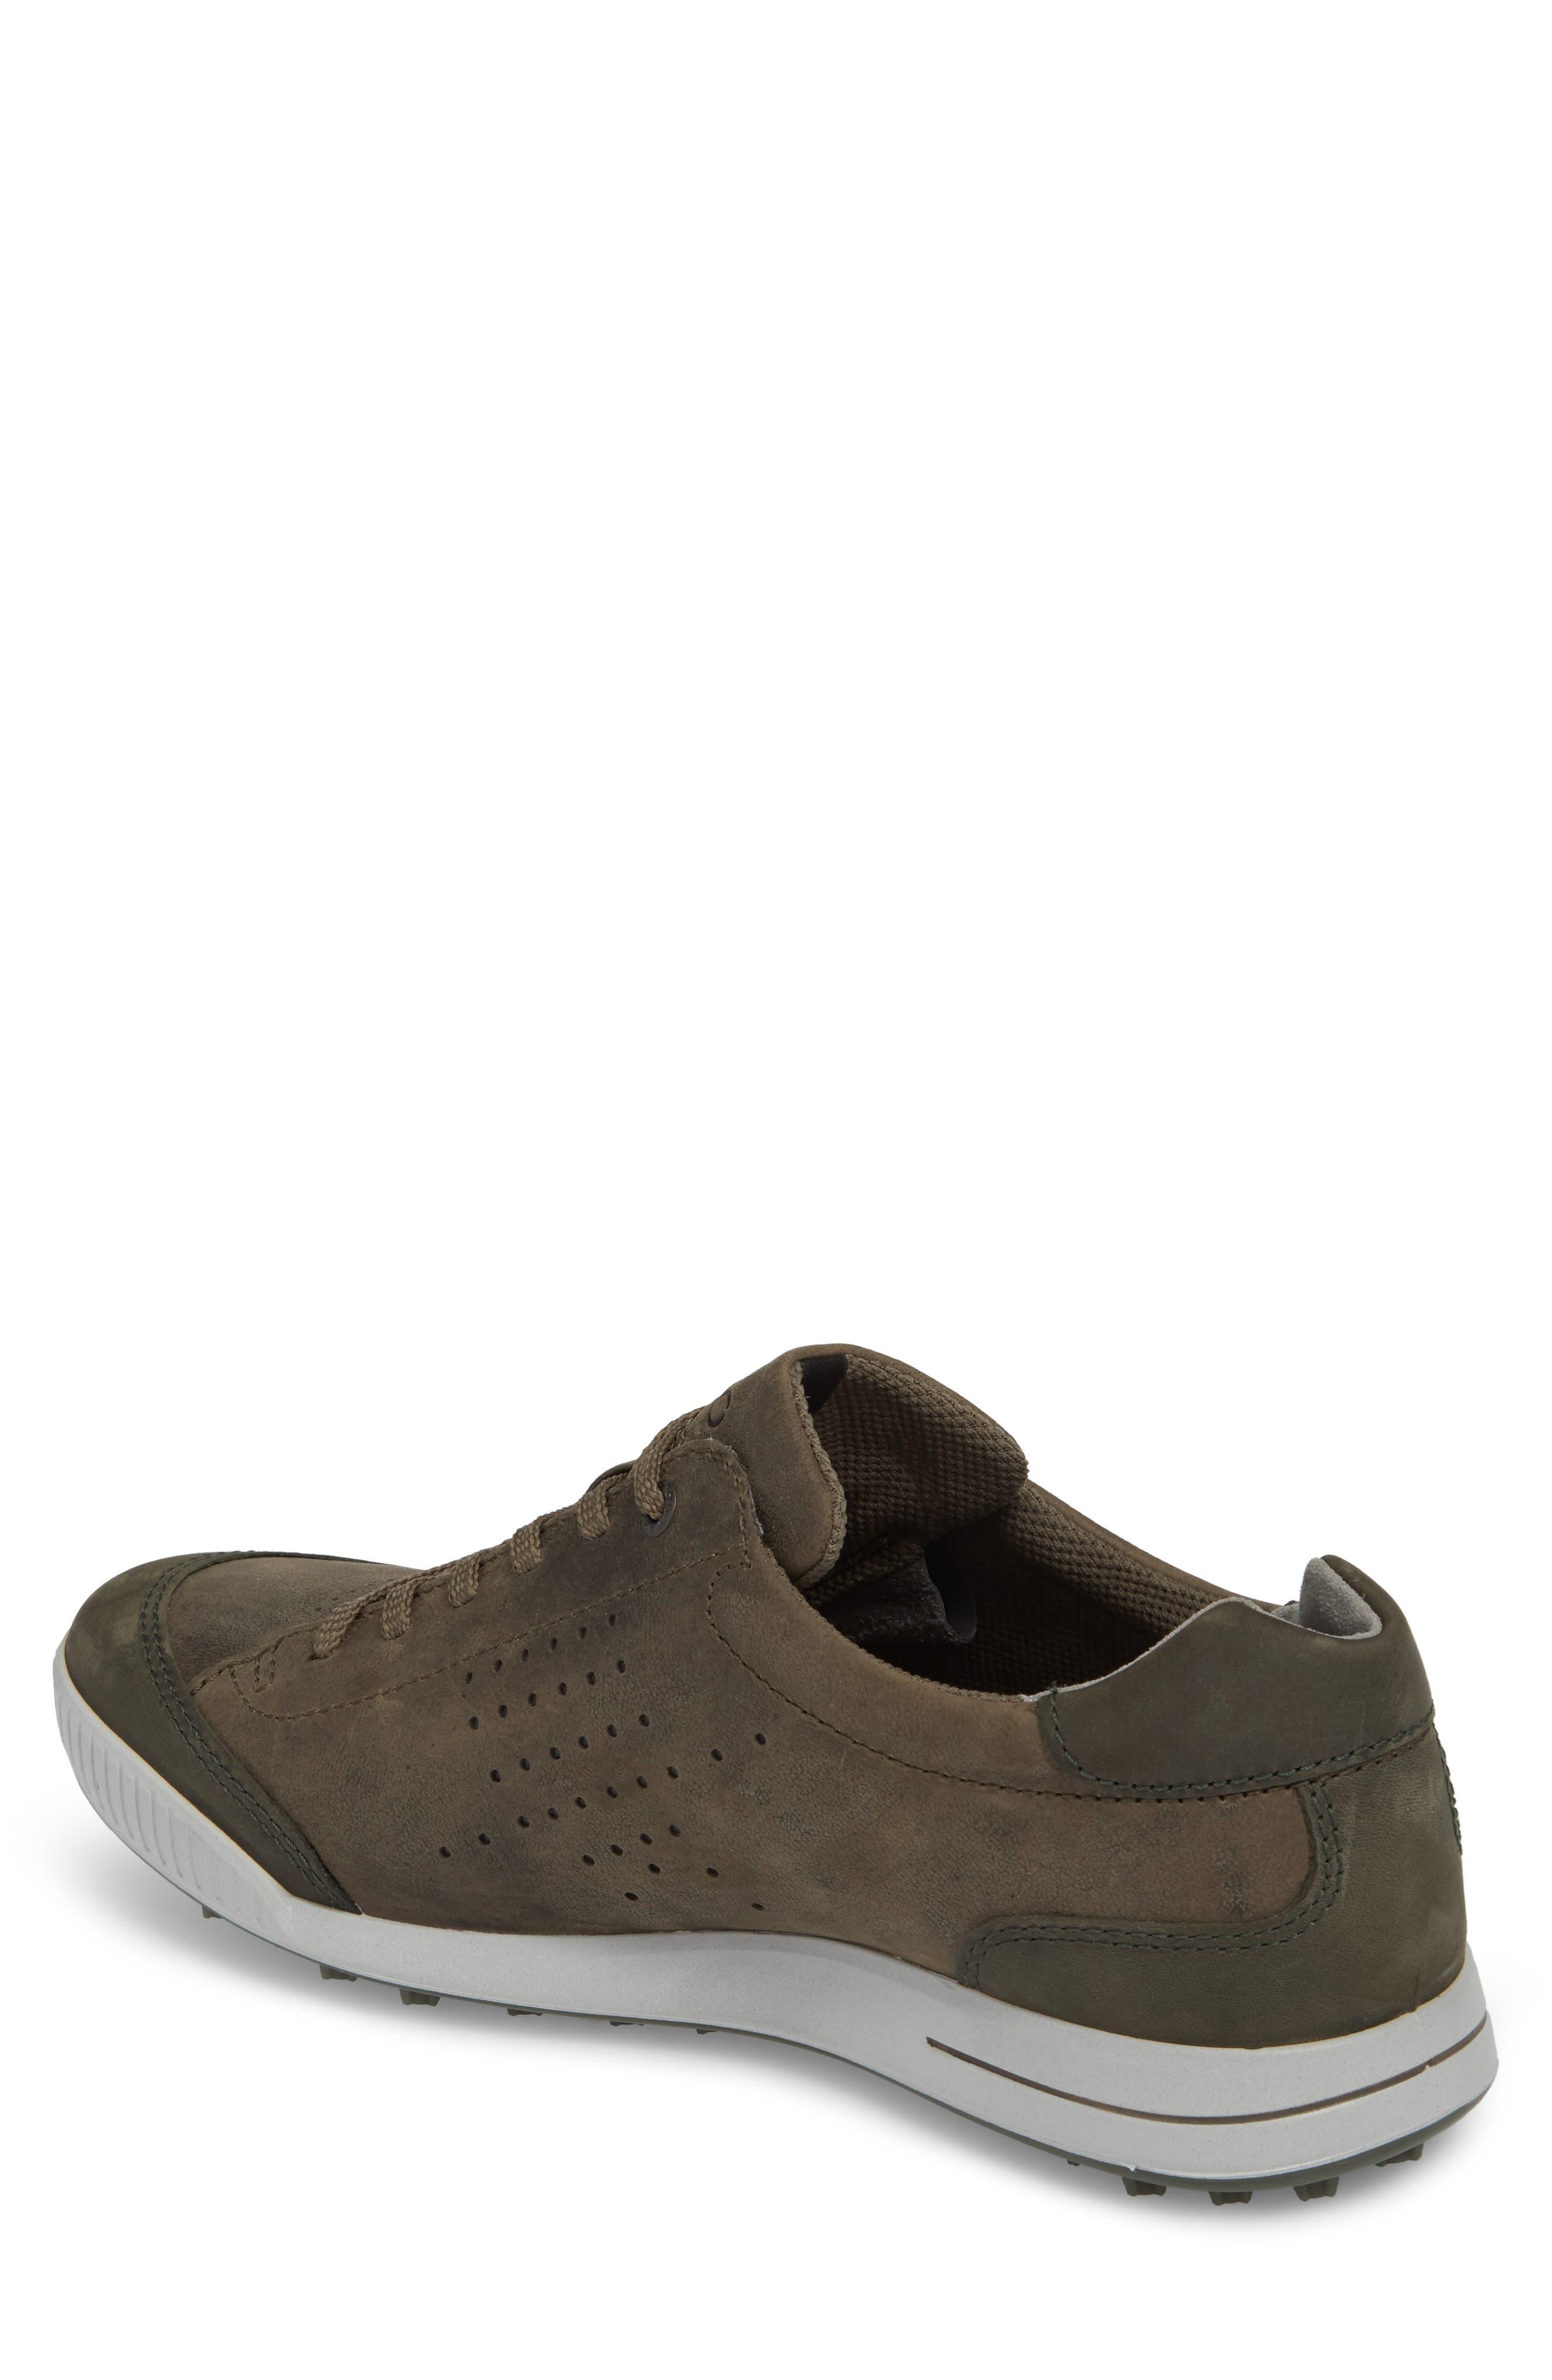 Street Retro HM Golf Shoe,                             Alternate thumbnail 2, color,                             Tarmac/ Deep Fore Leather